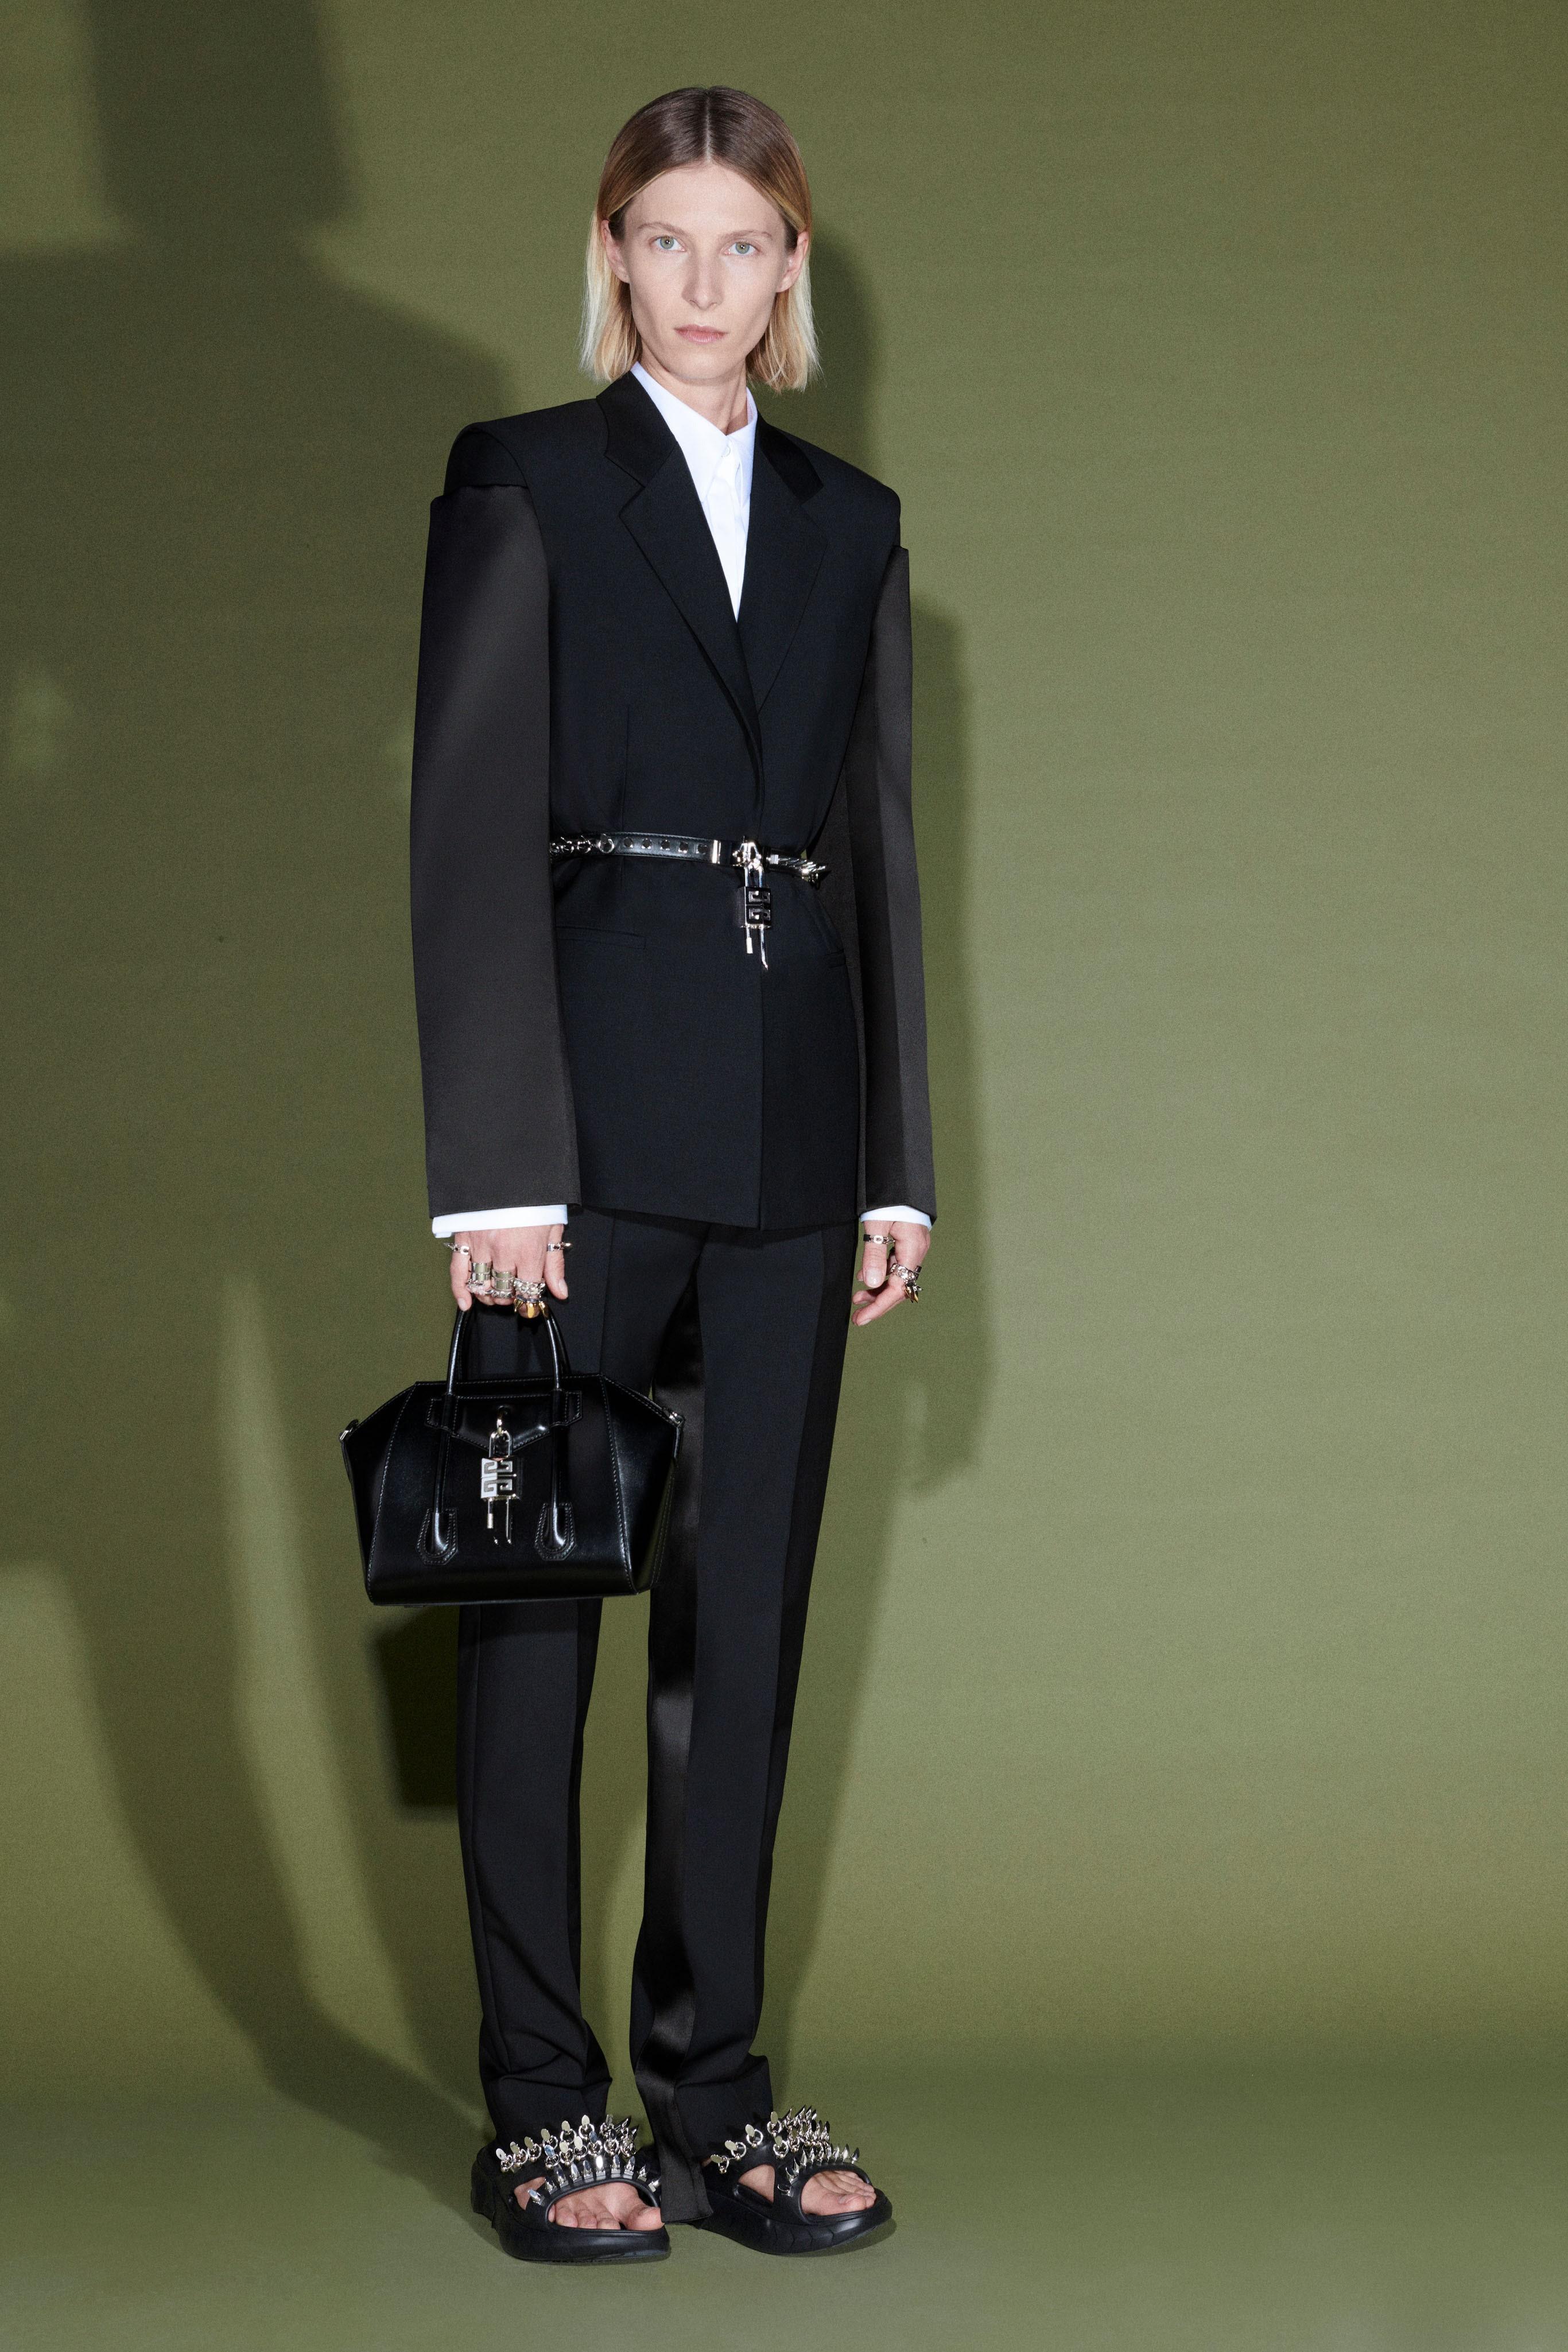 00042-Givenchy-Pre-Fall-21